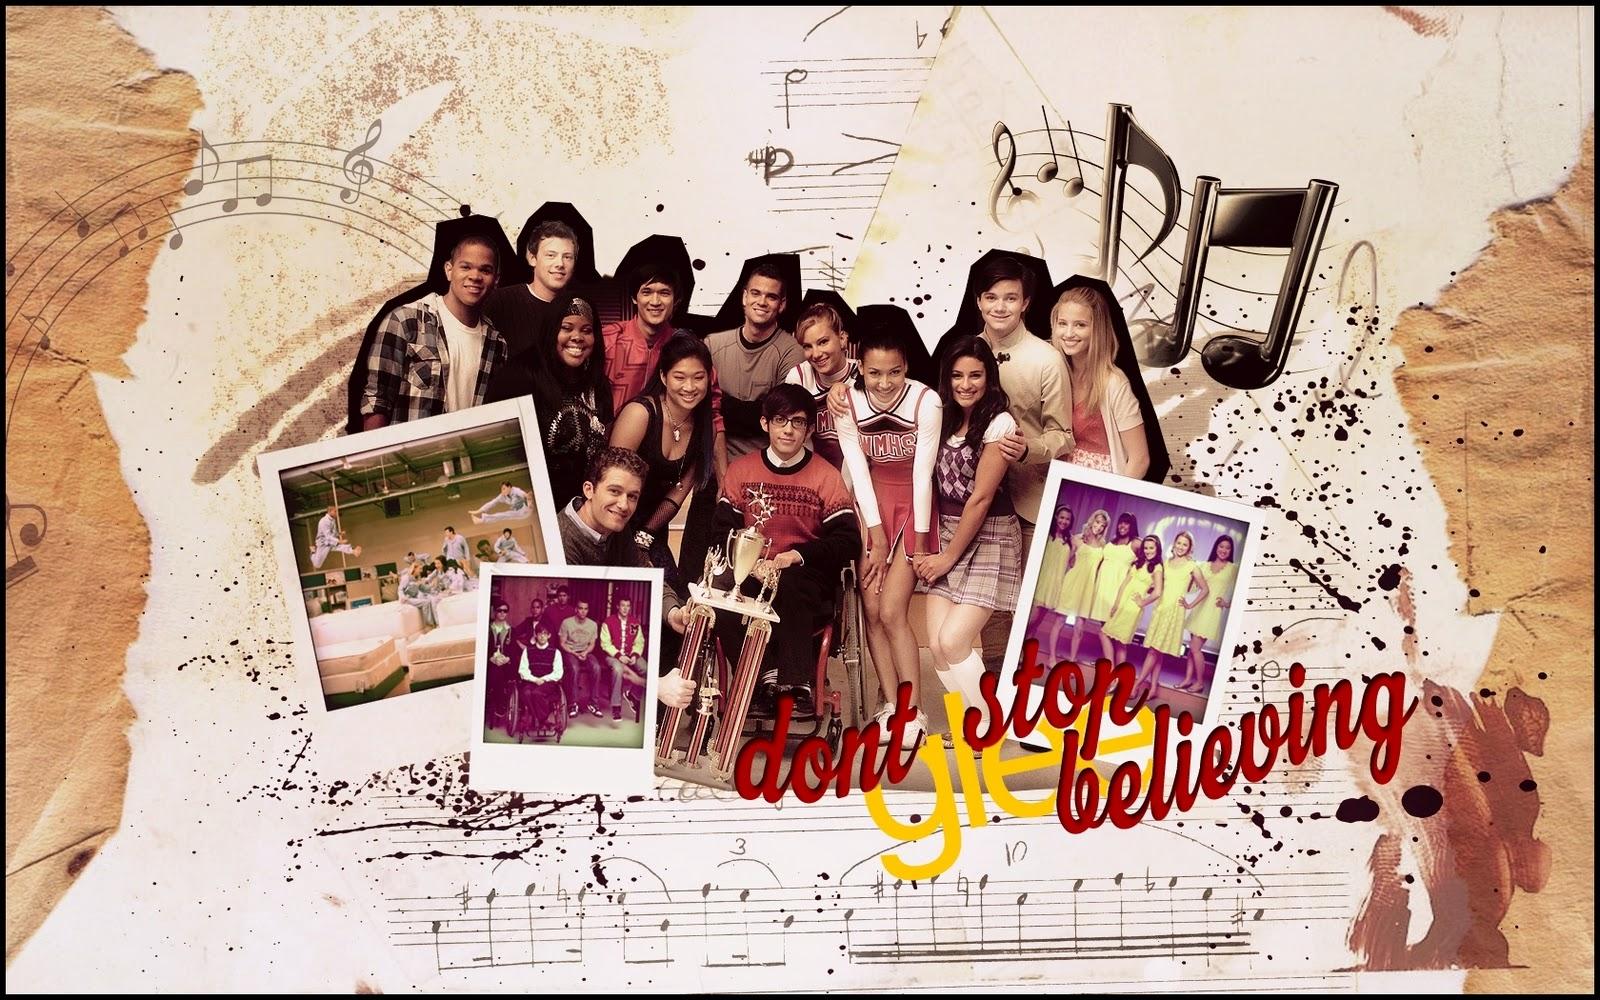 http://3.bp.blogspot.com/_E26Ndy_oKVc/TOSsB0vxc2I/AAAAAAAAAj4/EN5heYAujcY/s1600/Glee-Cast-Wallpaper-glee-10752201-1680-1050.jpg